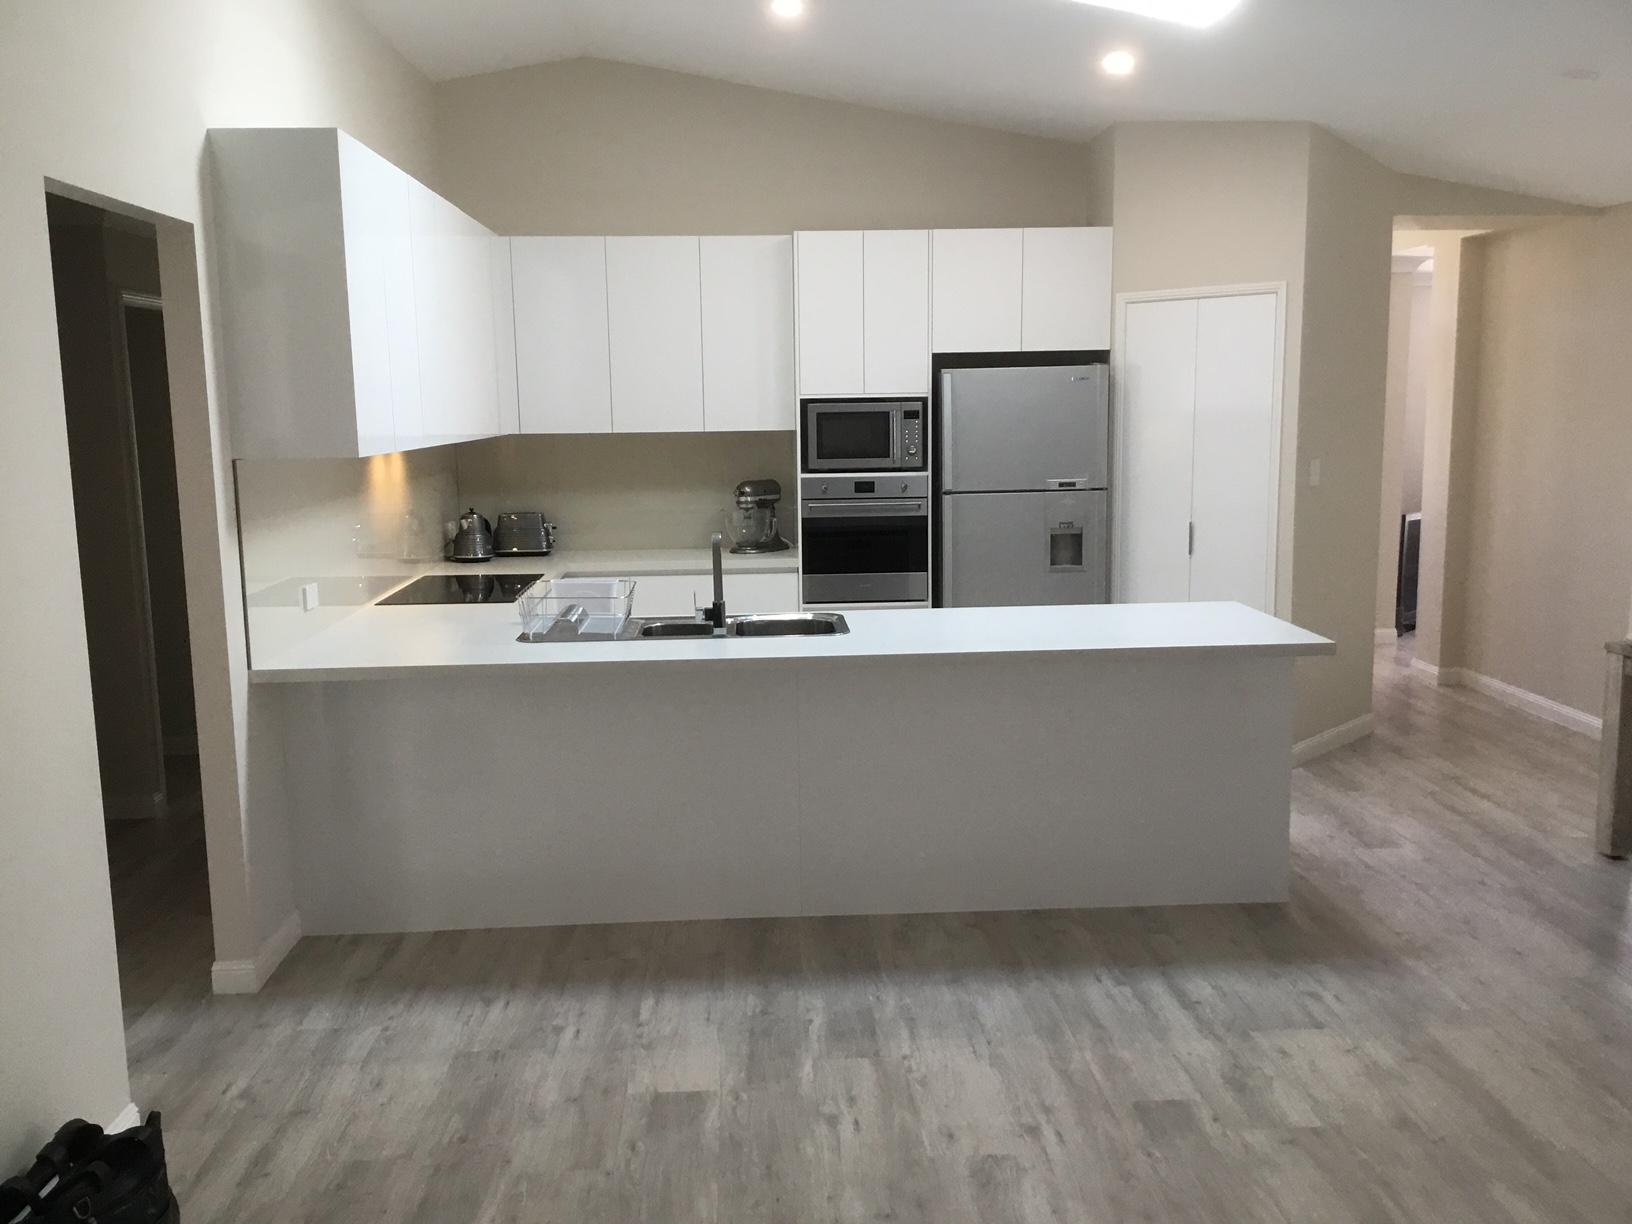 Kitchen Renovations - Gold Coast - Kitchen renovation tips